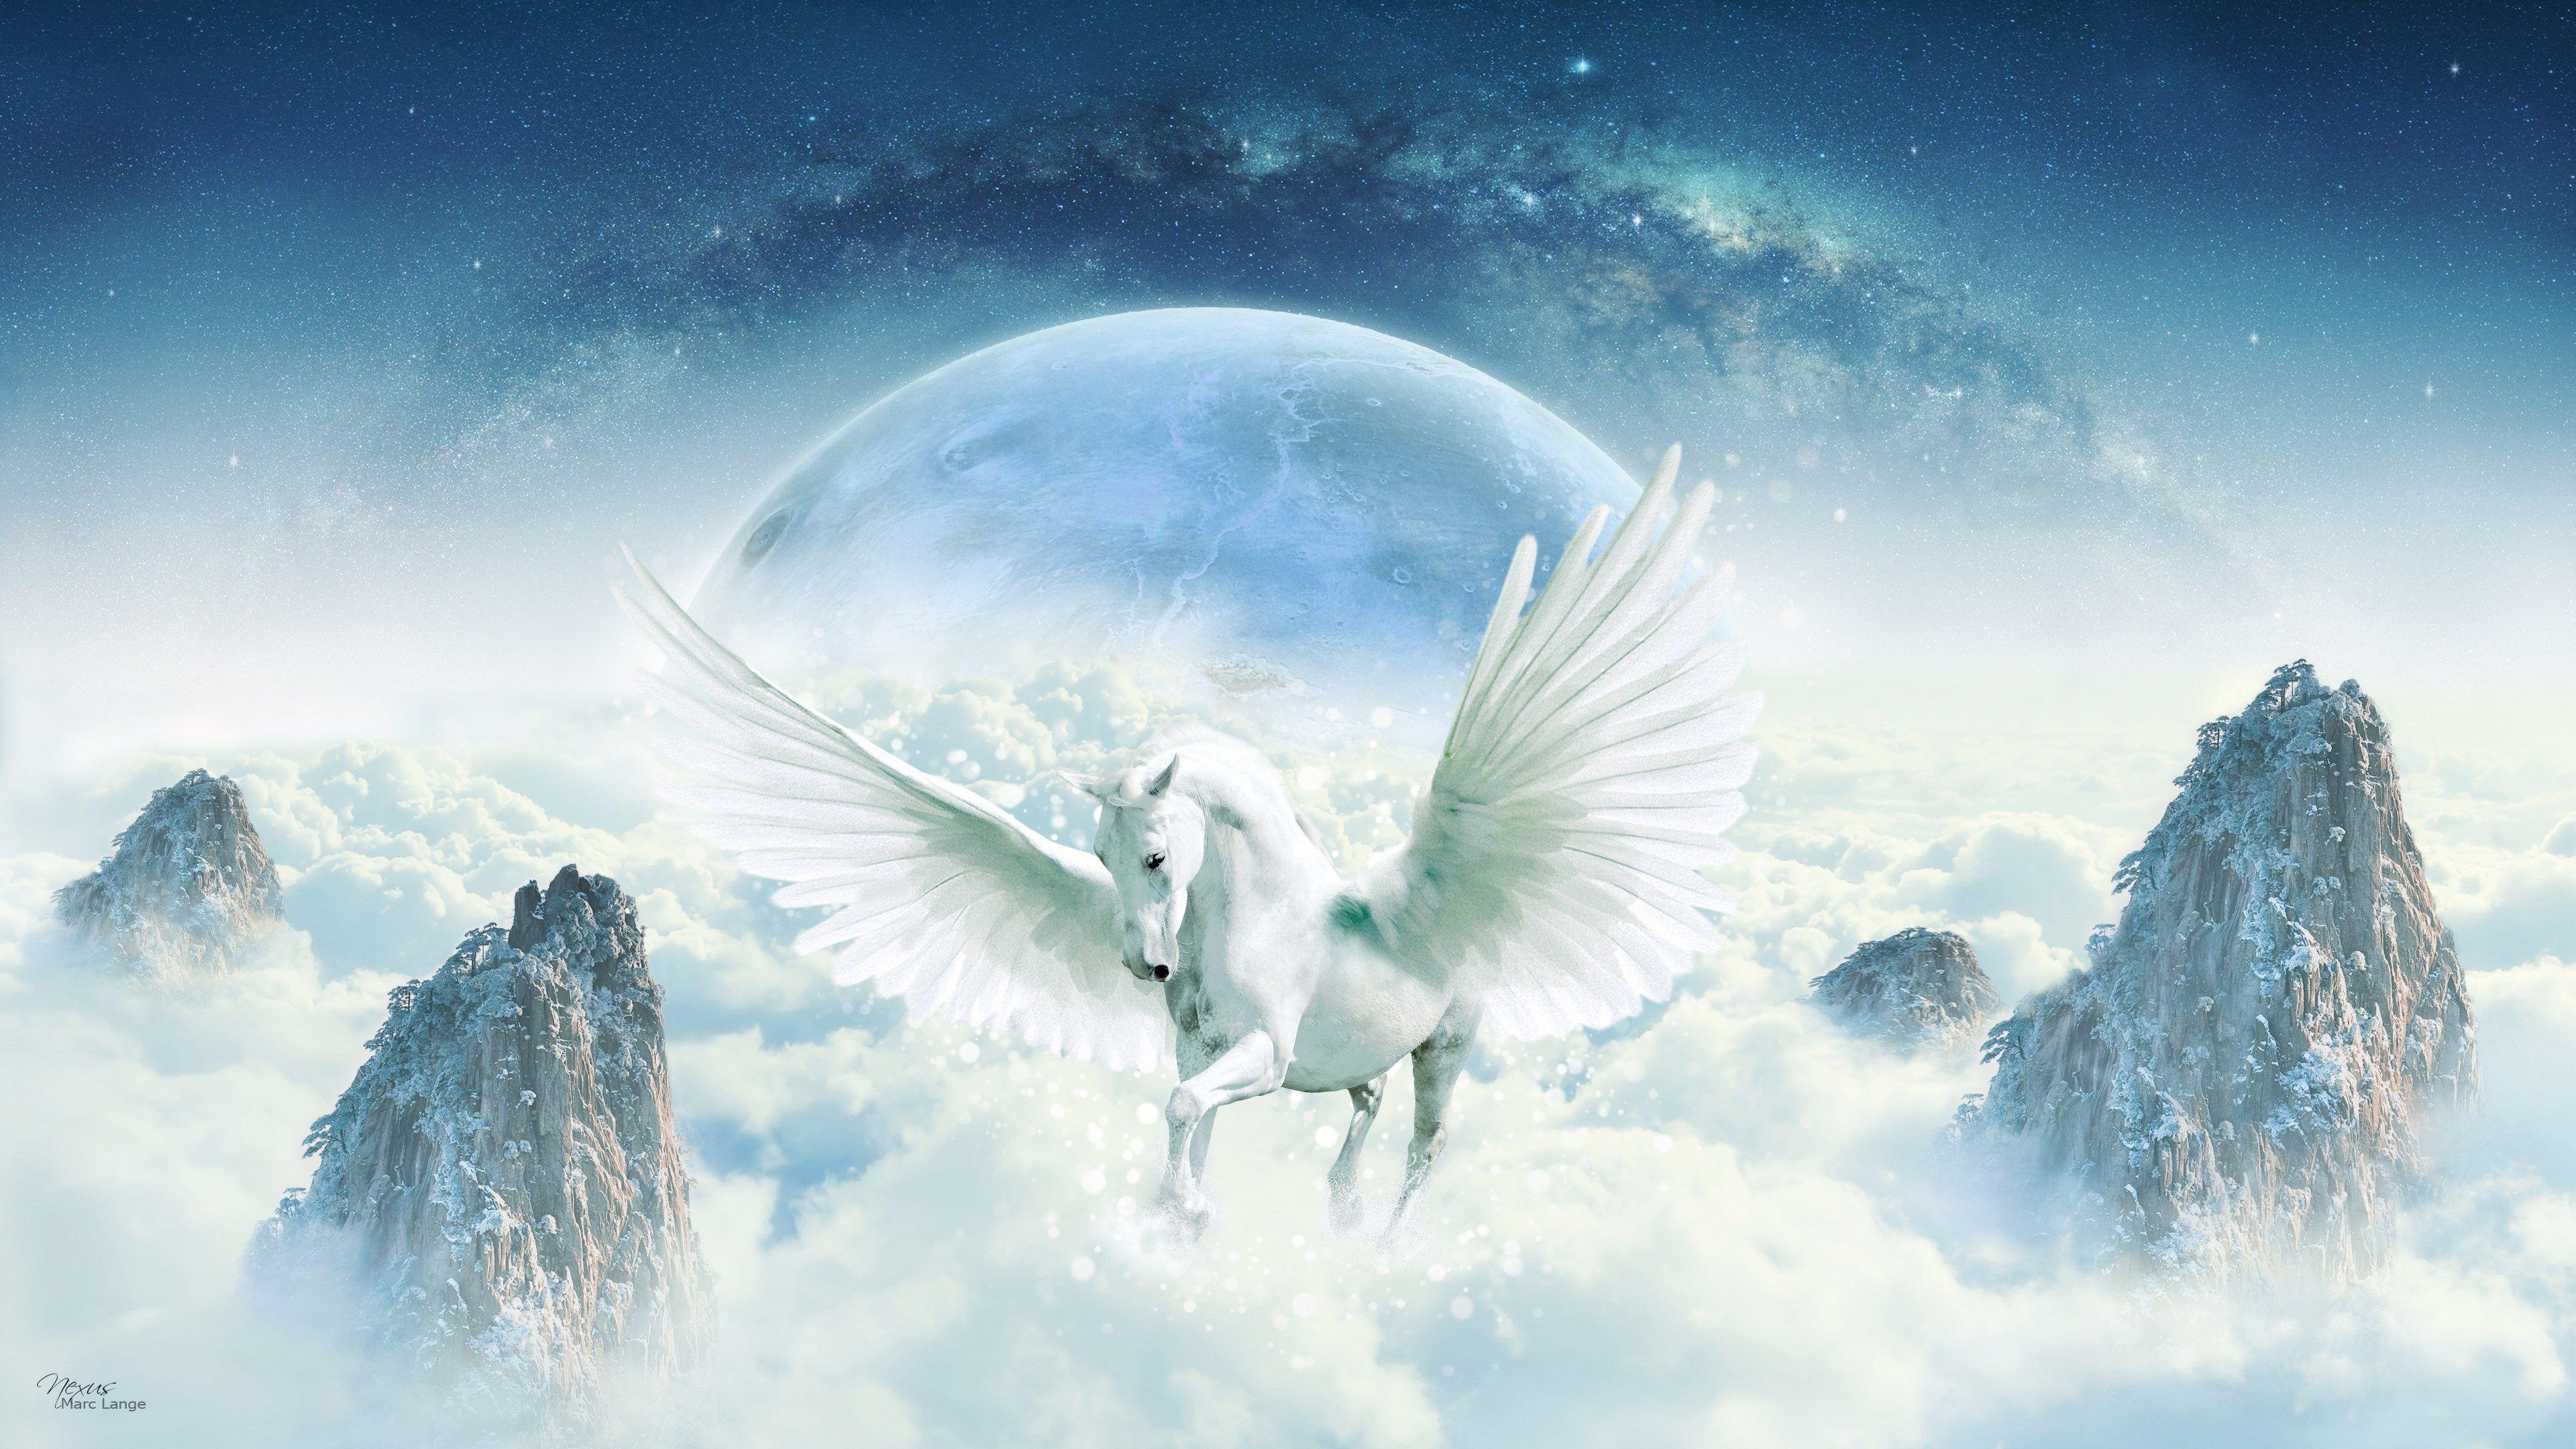 3840x2160 Unicorn 4k Free Full Screen Wallpaper Unicorn Wallpaper Unicorn Backgrounds Screensaver Pictures